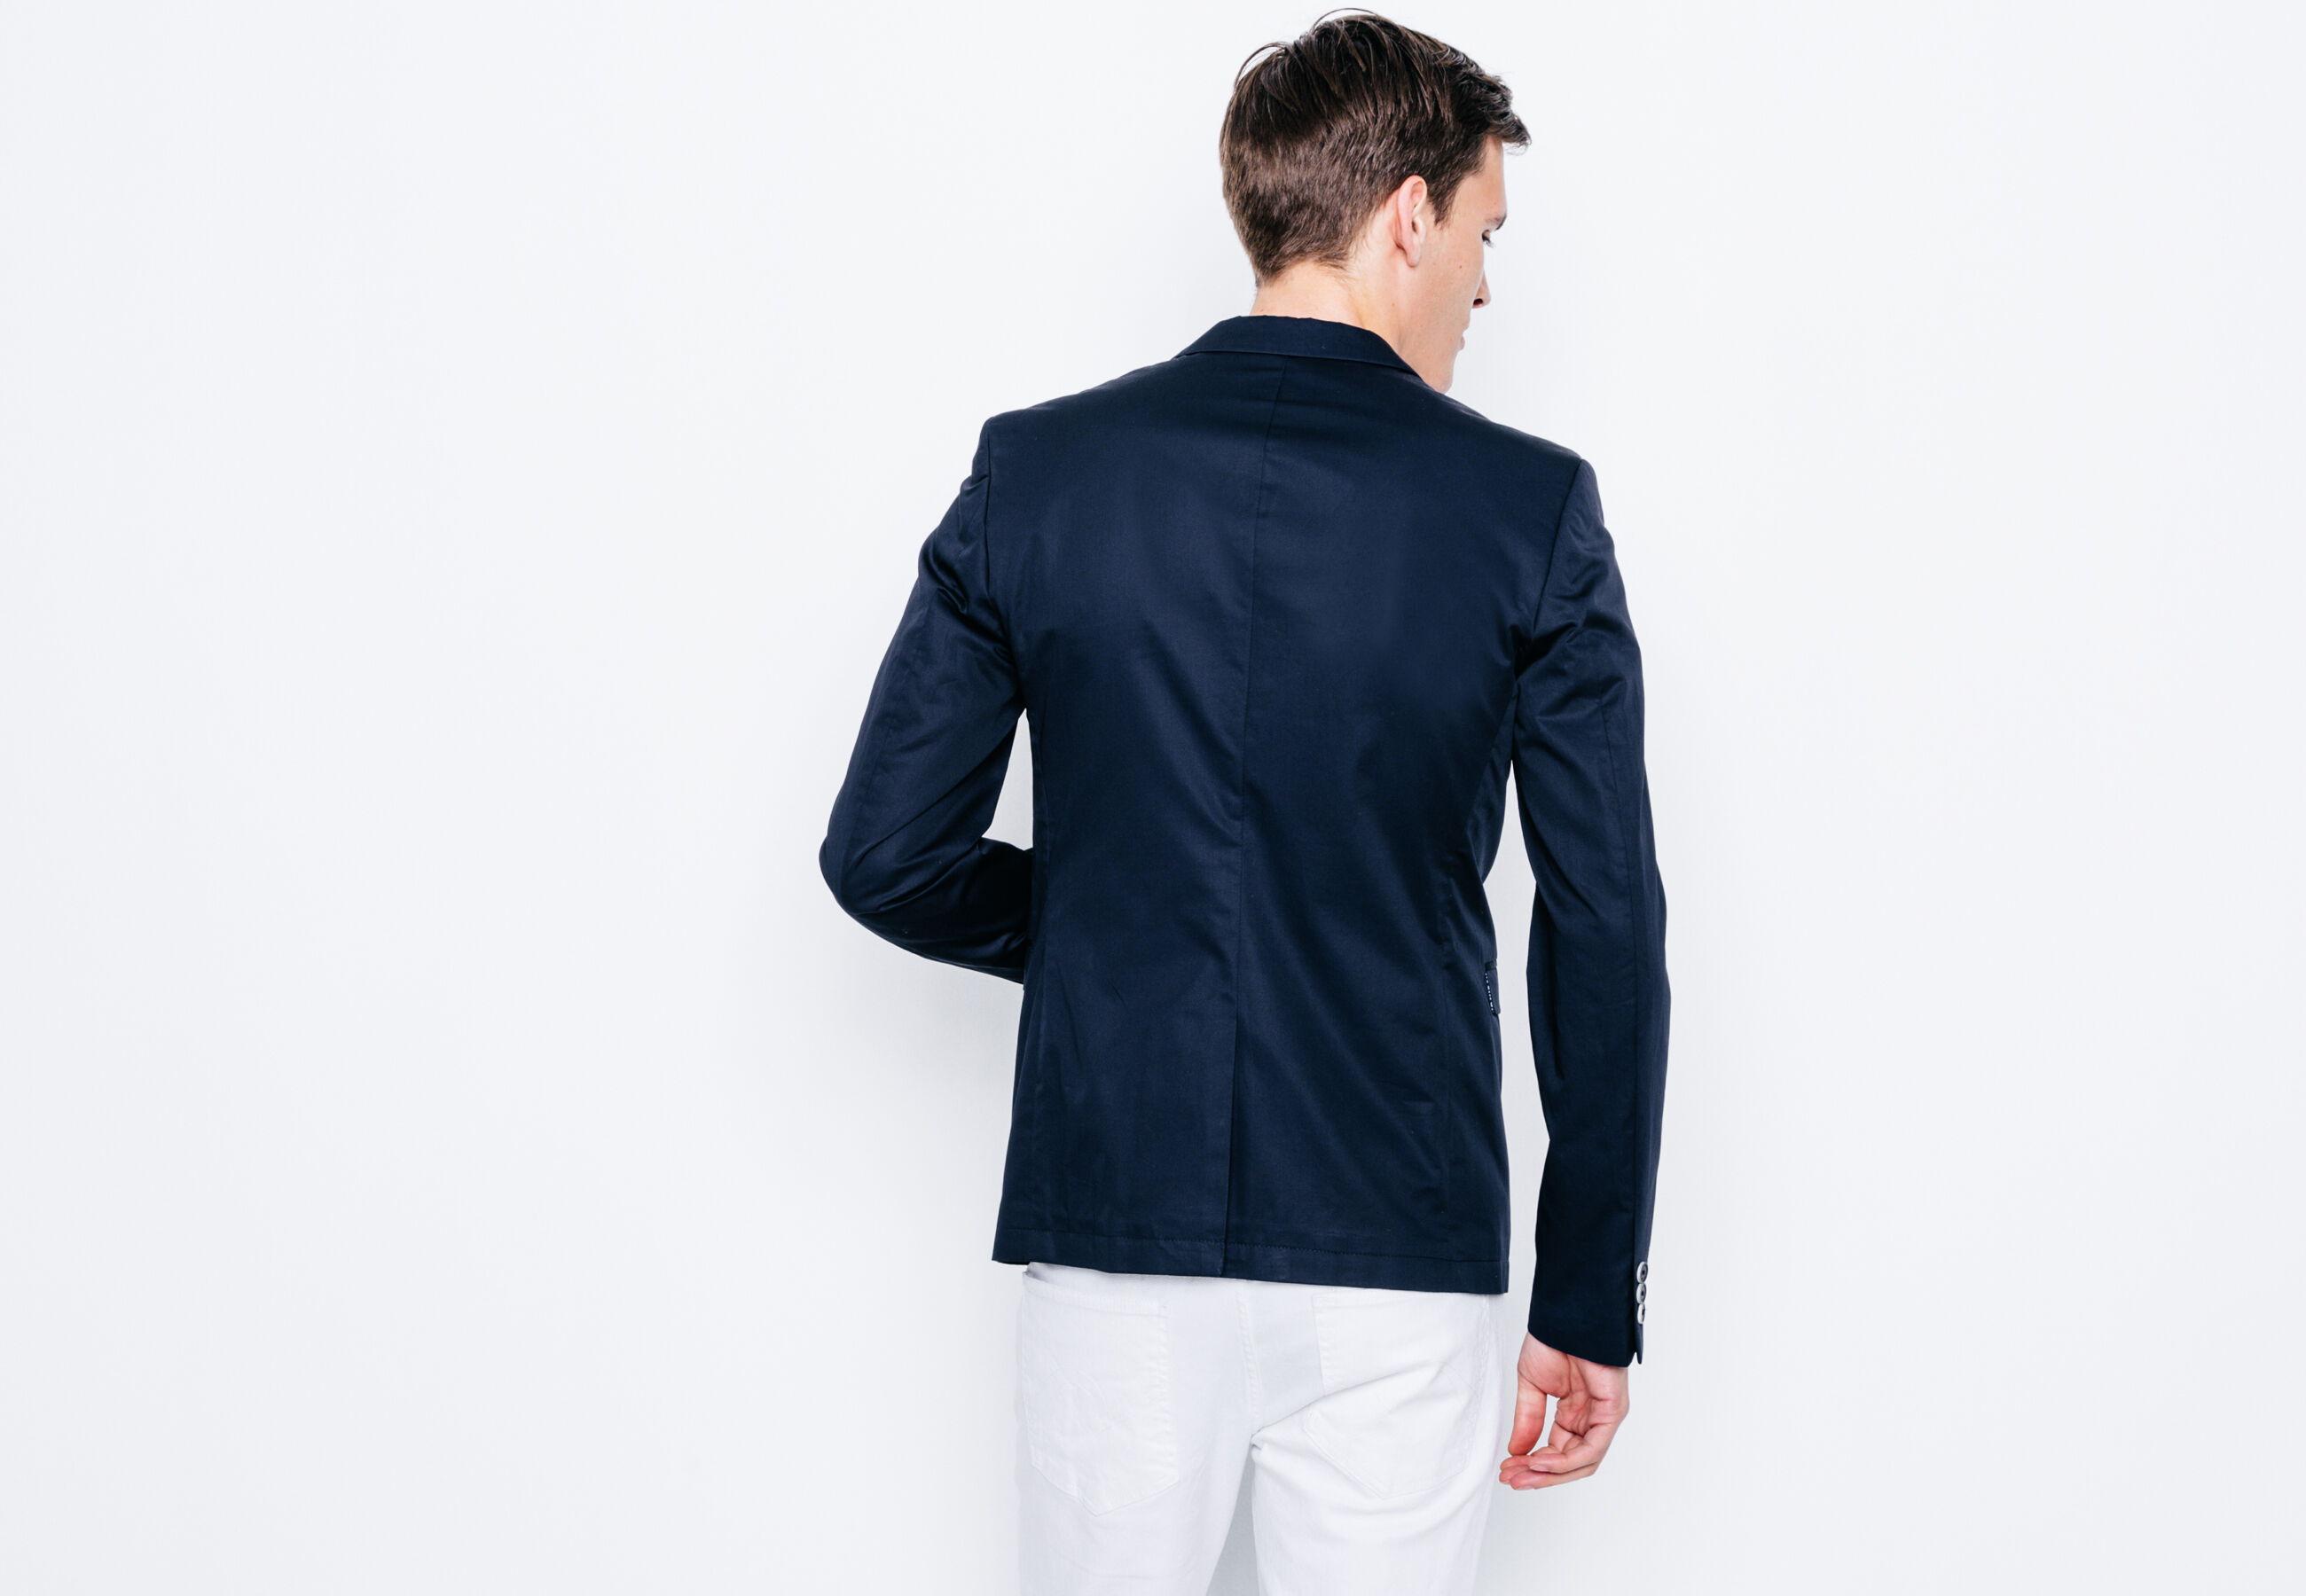 veste slim coton technique bleu marine homme jules. Black Bedroom Furniture Sets. Home Design Ideas